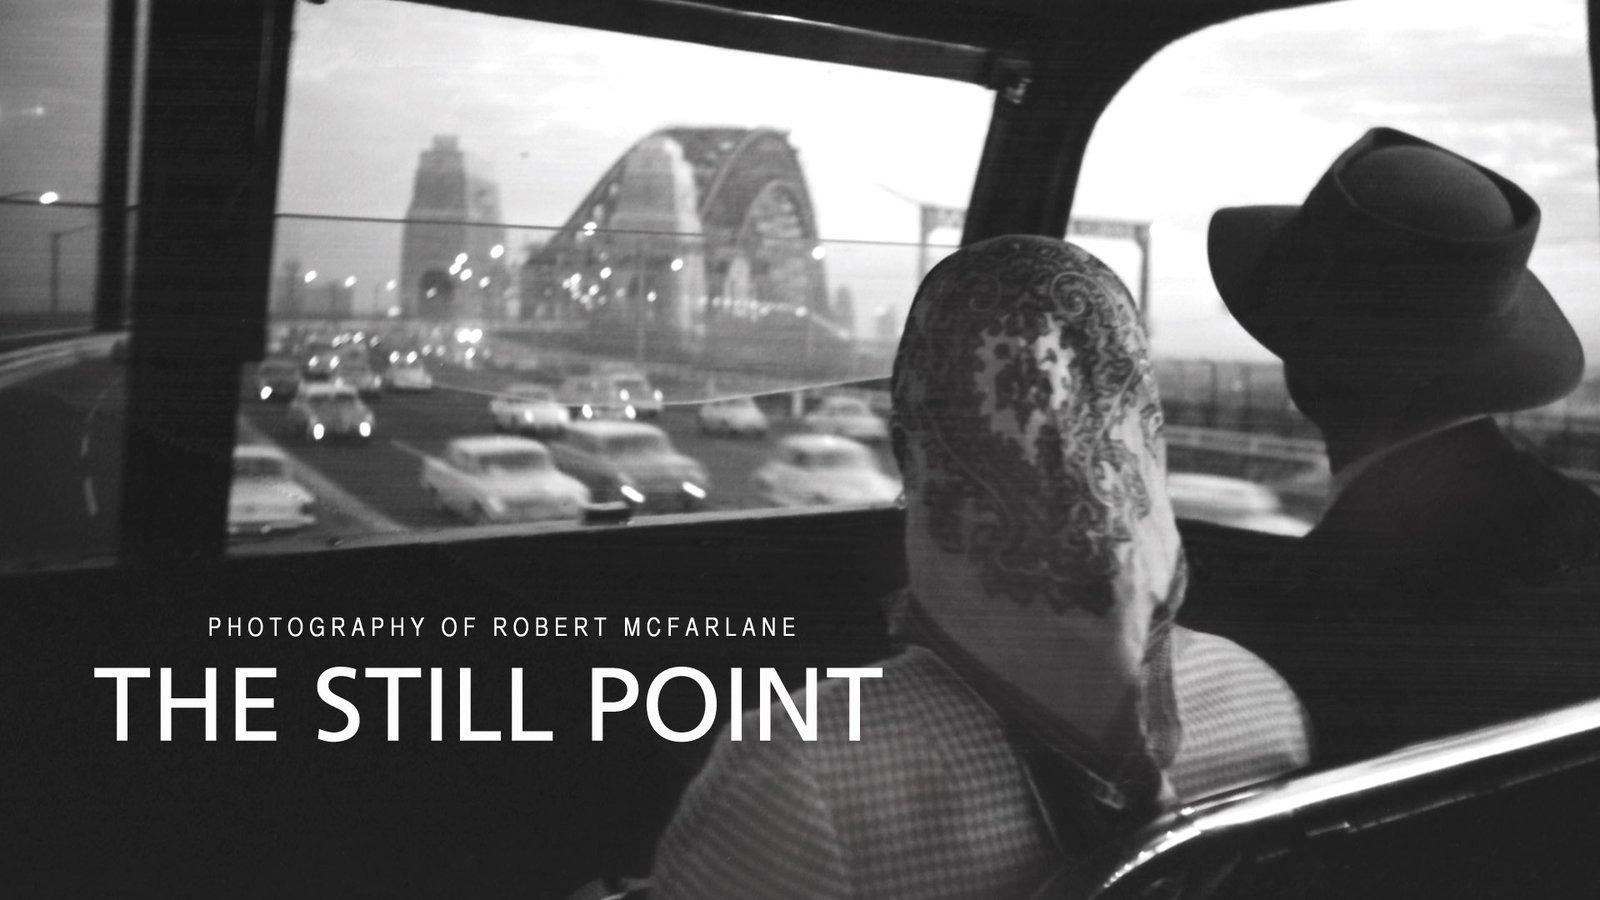 The Still Point - Photography Of Robert McFarlane